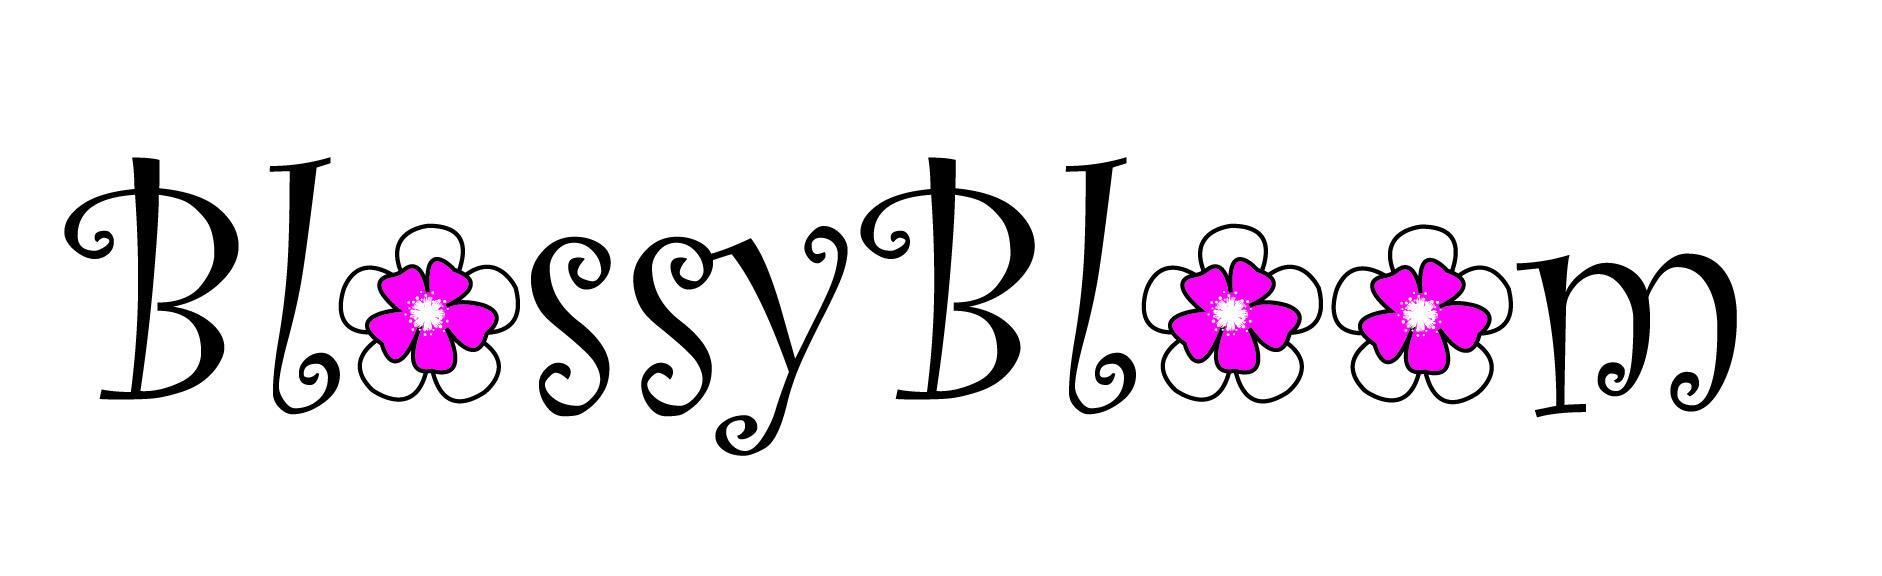 BlossyBloom_Logo_22-4.jpg